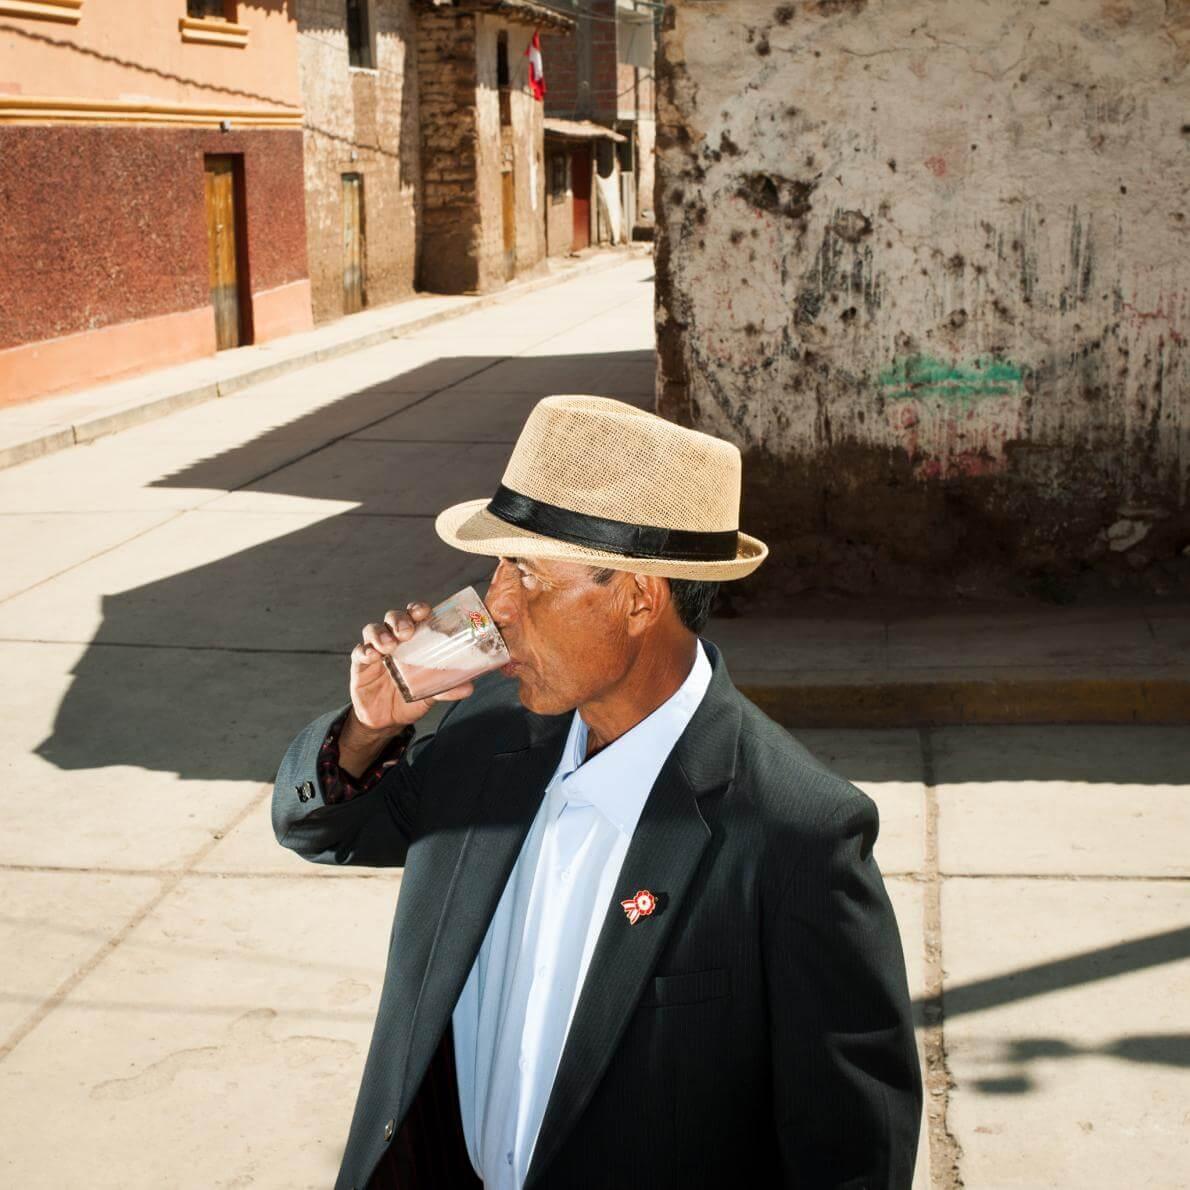 Перуанець п'є кукурудзяно-полуничне пиво